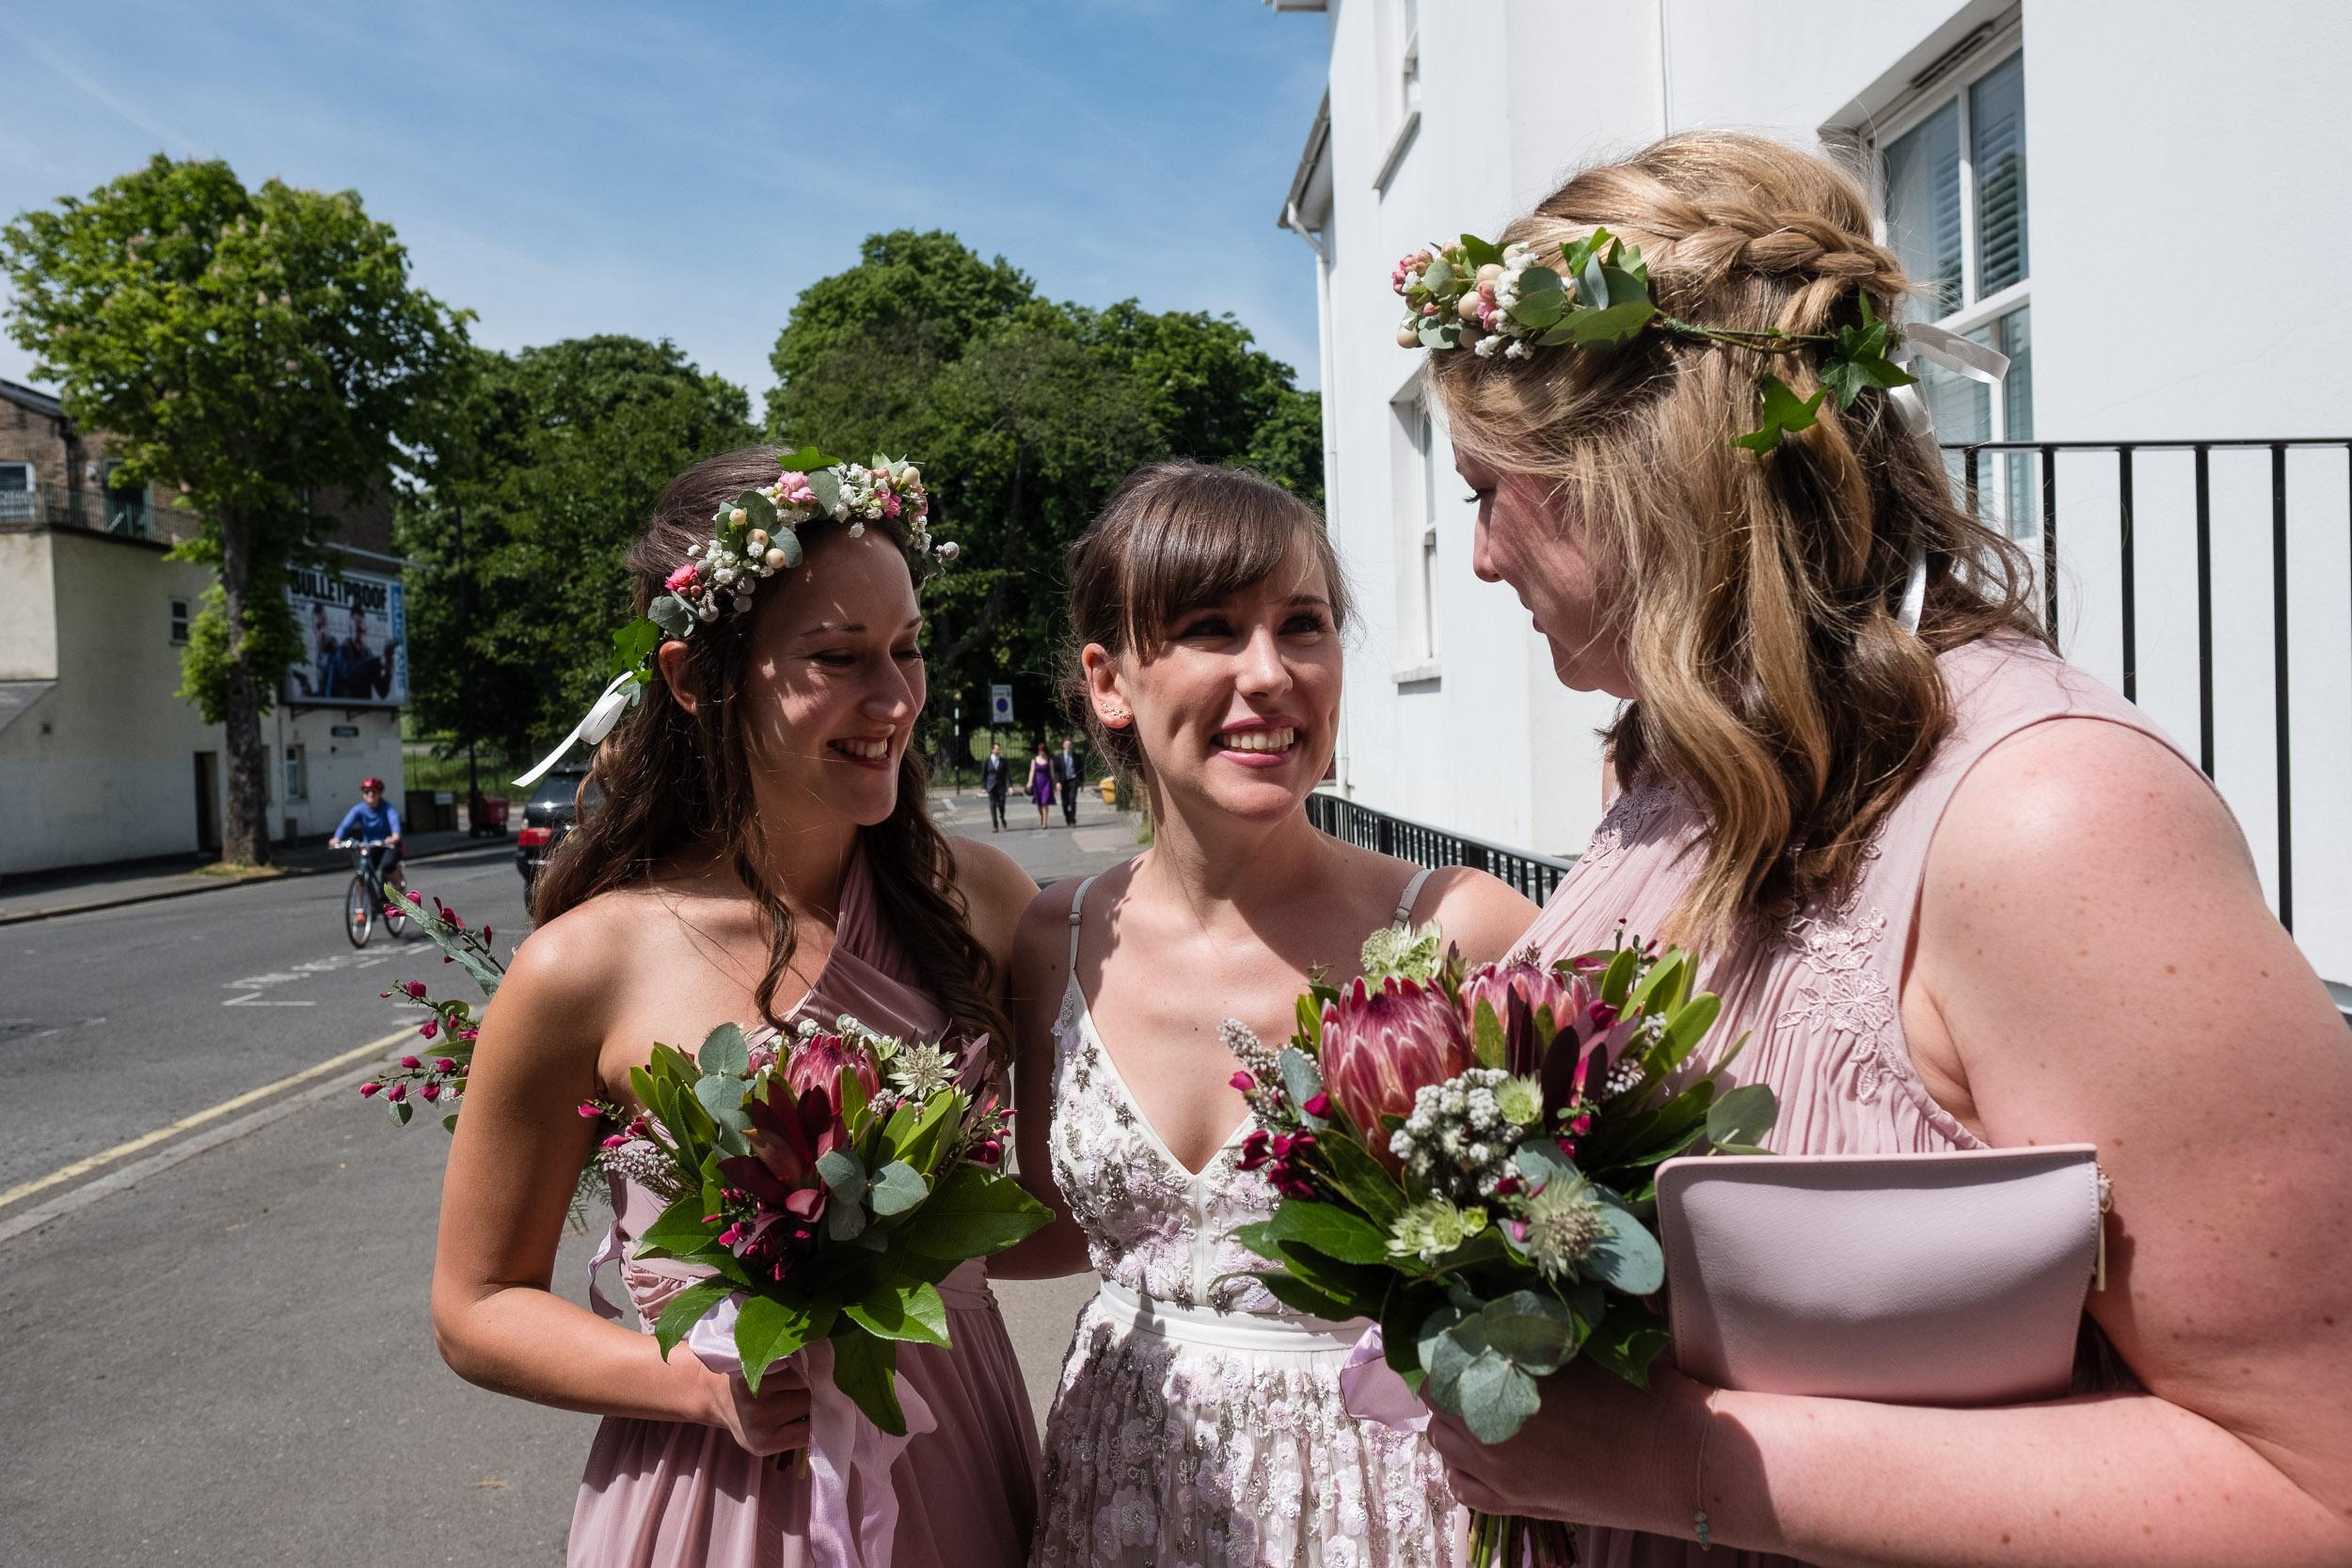 brockwell-lido-brixton-herne-hill-wedding-032.jpg